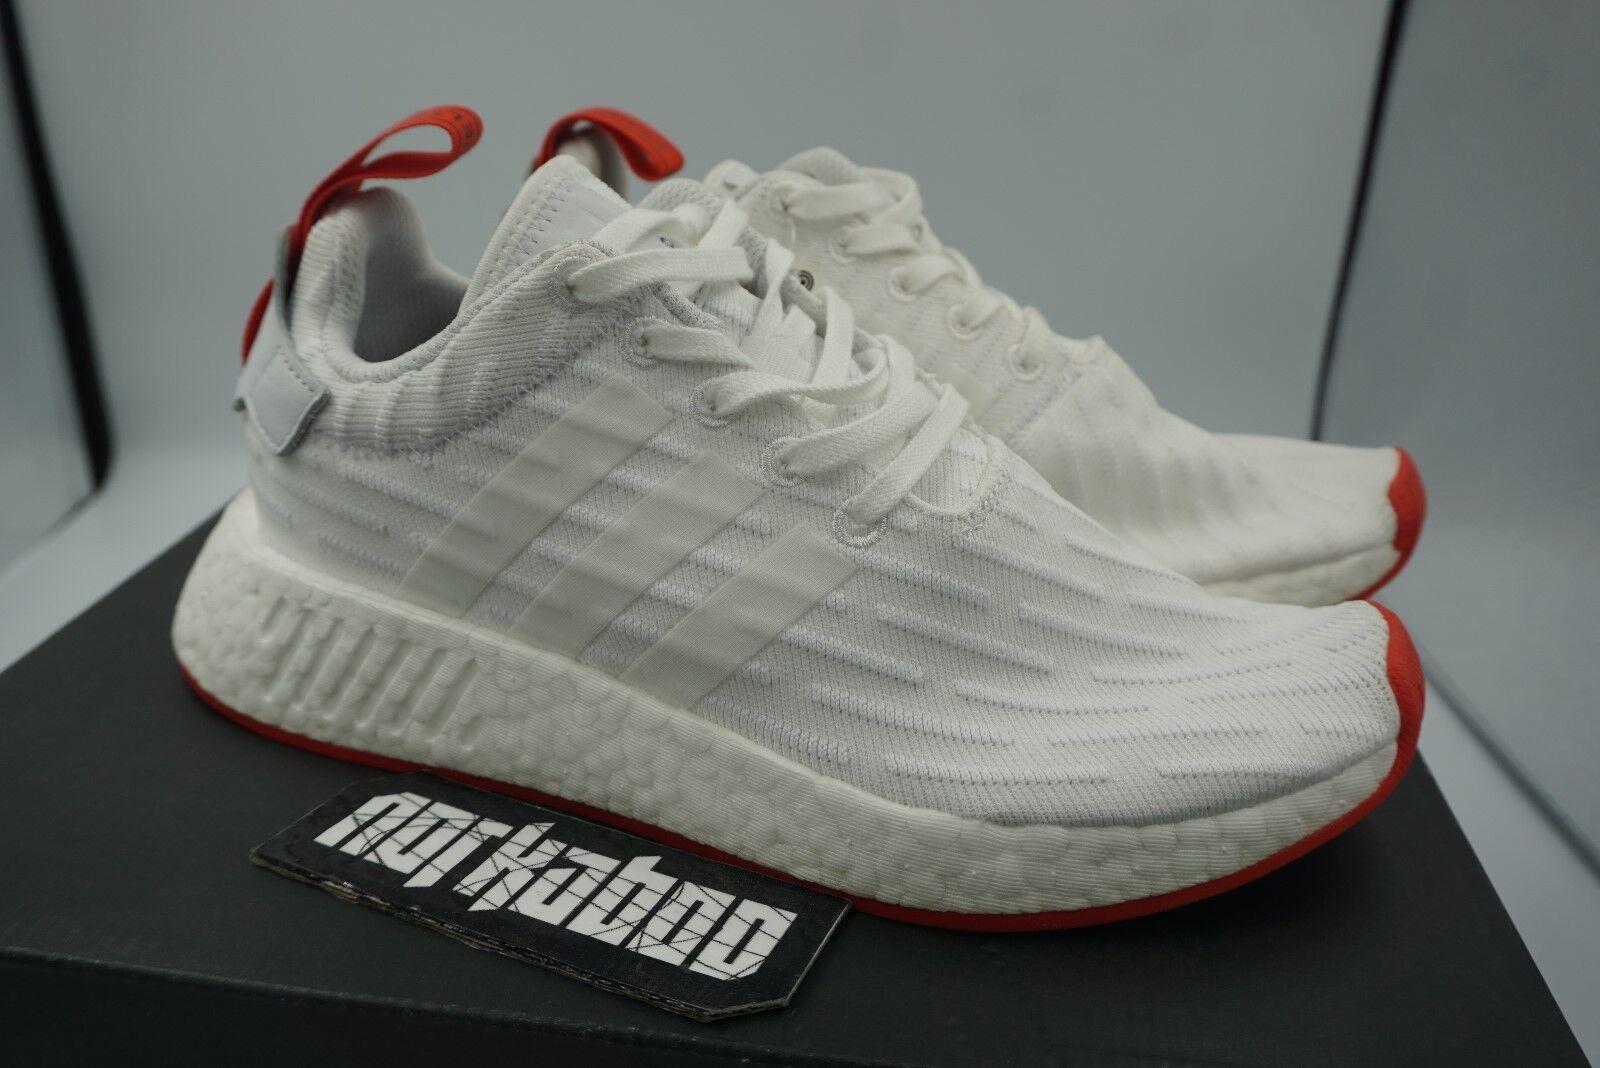 Adidas Pharrell Holi NMD raza humana negro tamaño 12 Yeezy Beluga off